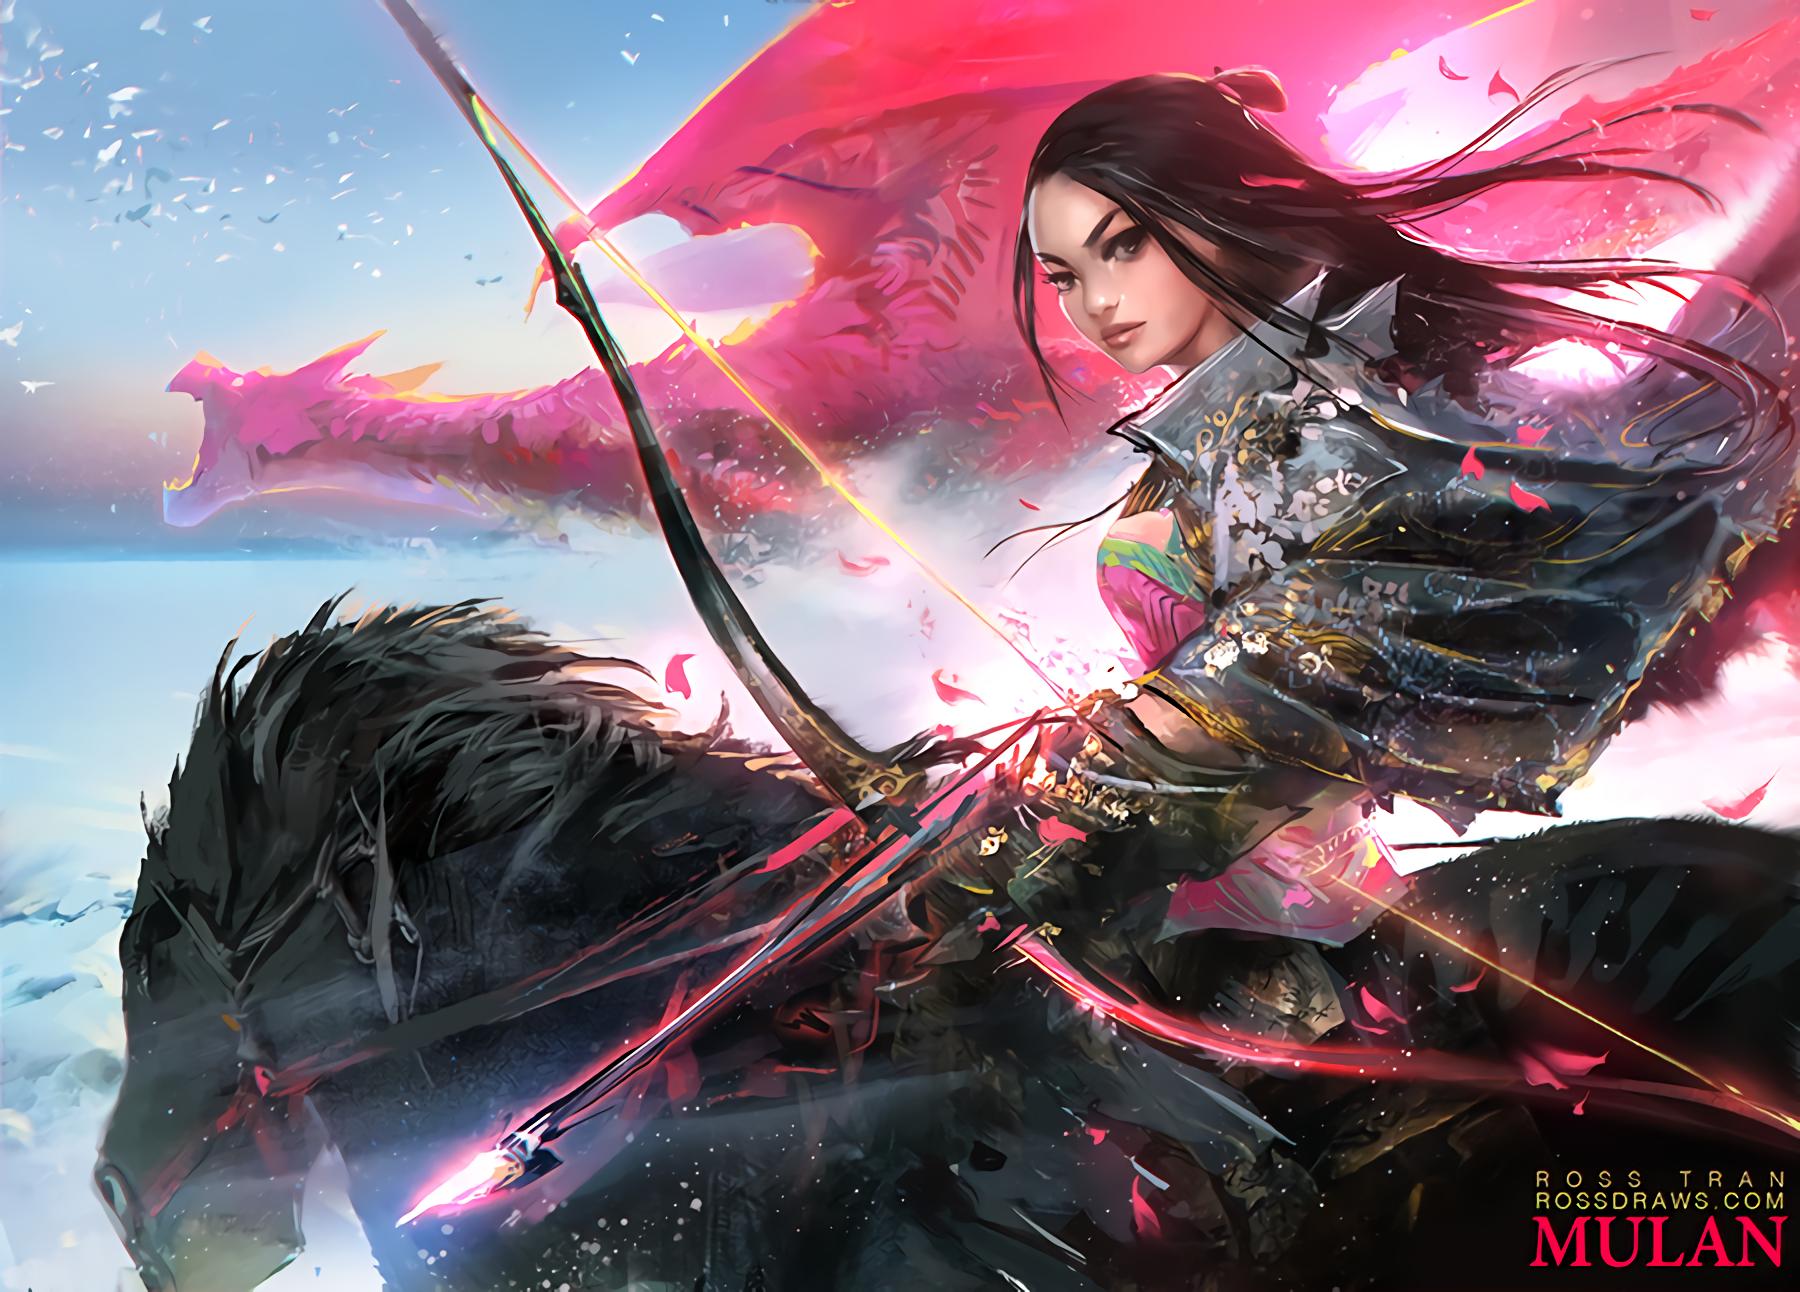 Epic Mulan Wallpaper And Background Image